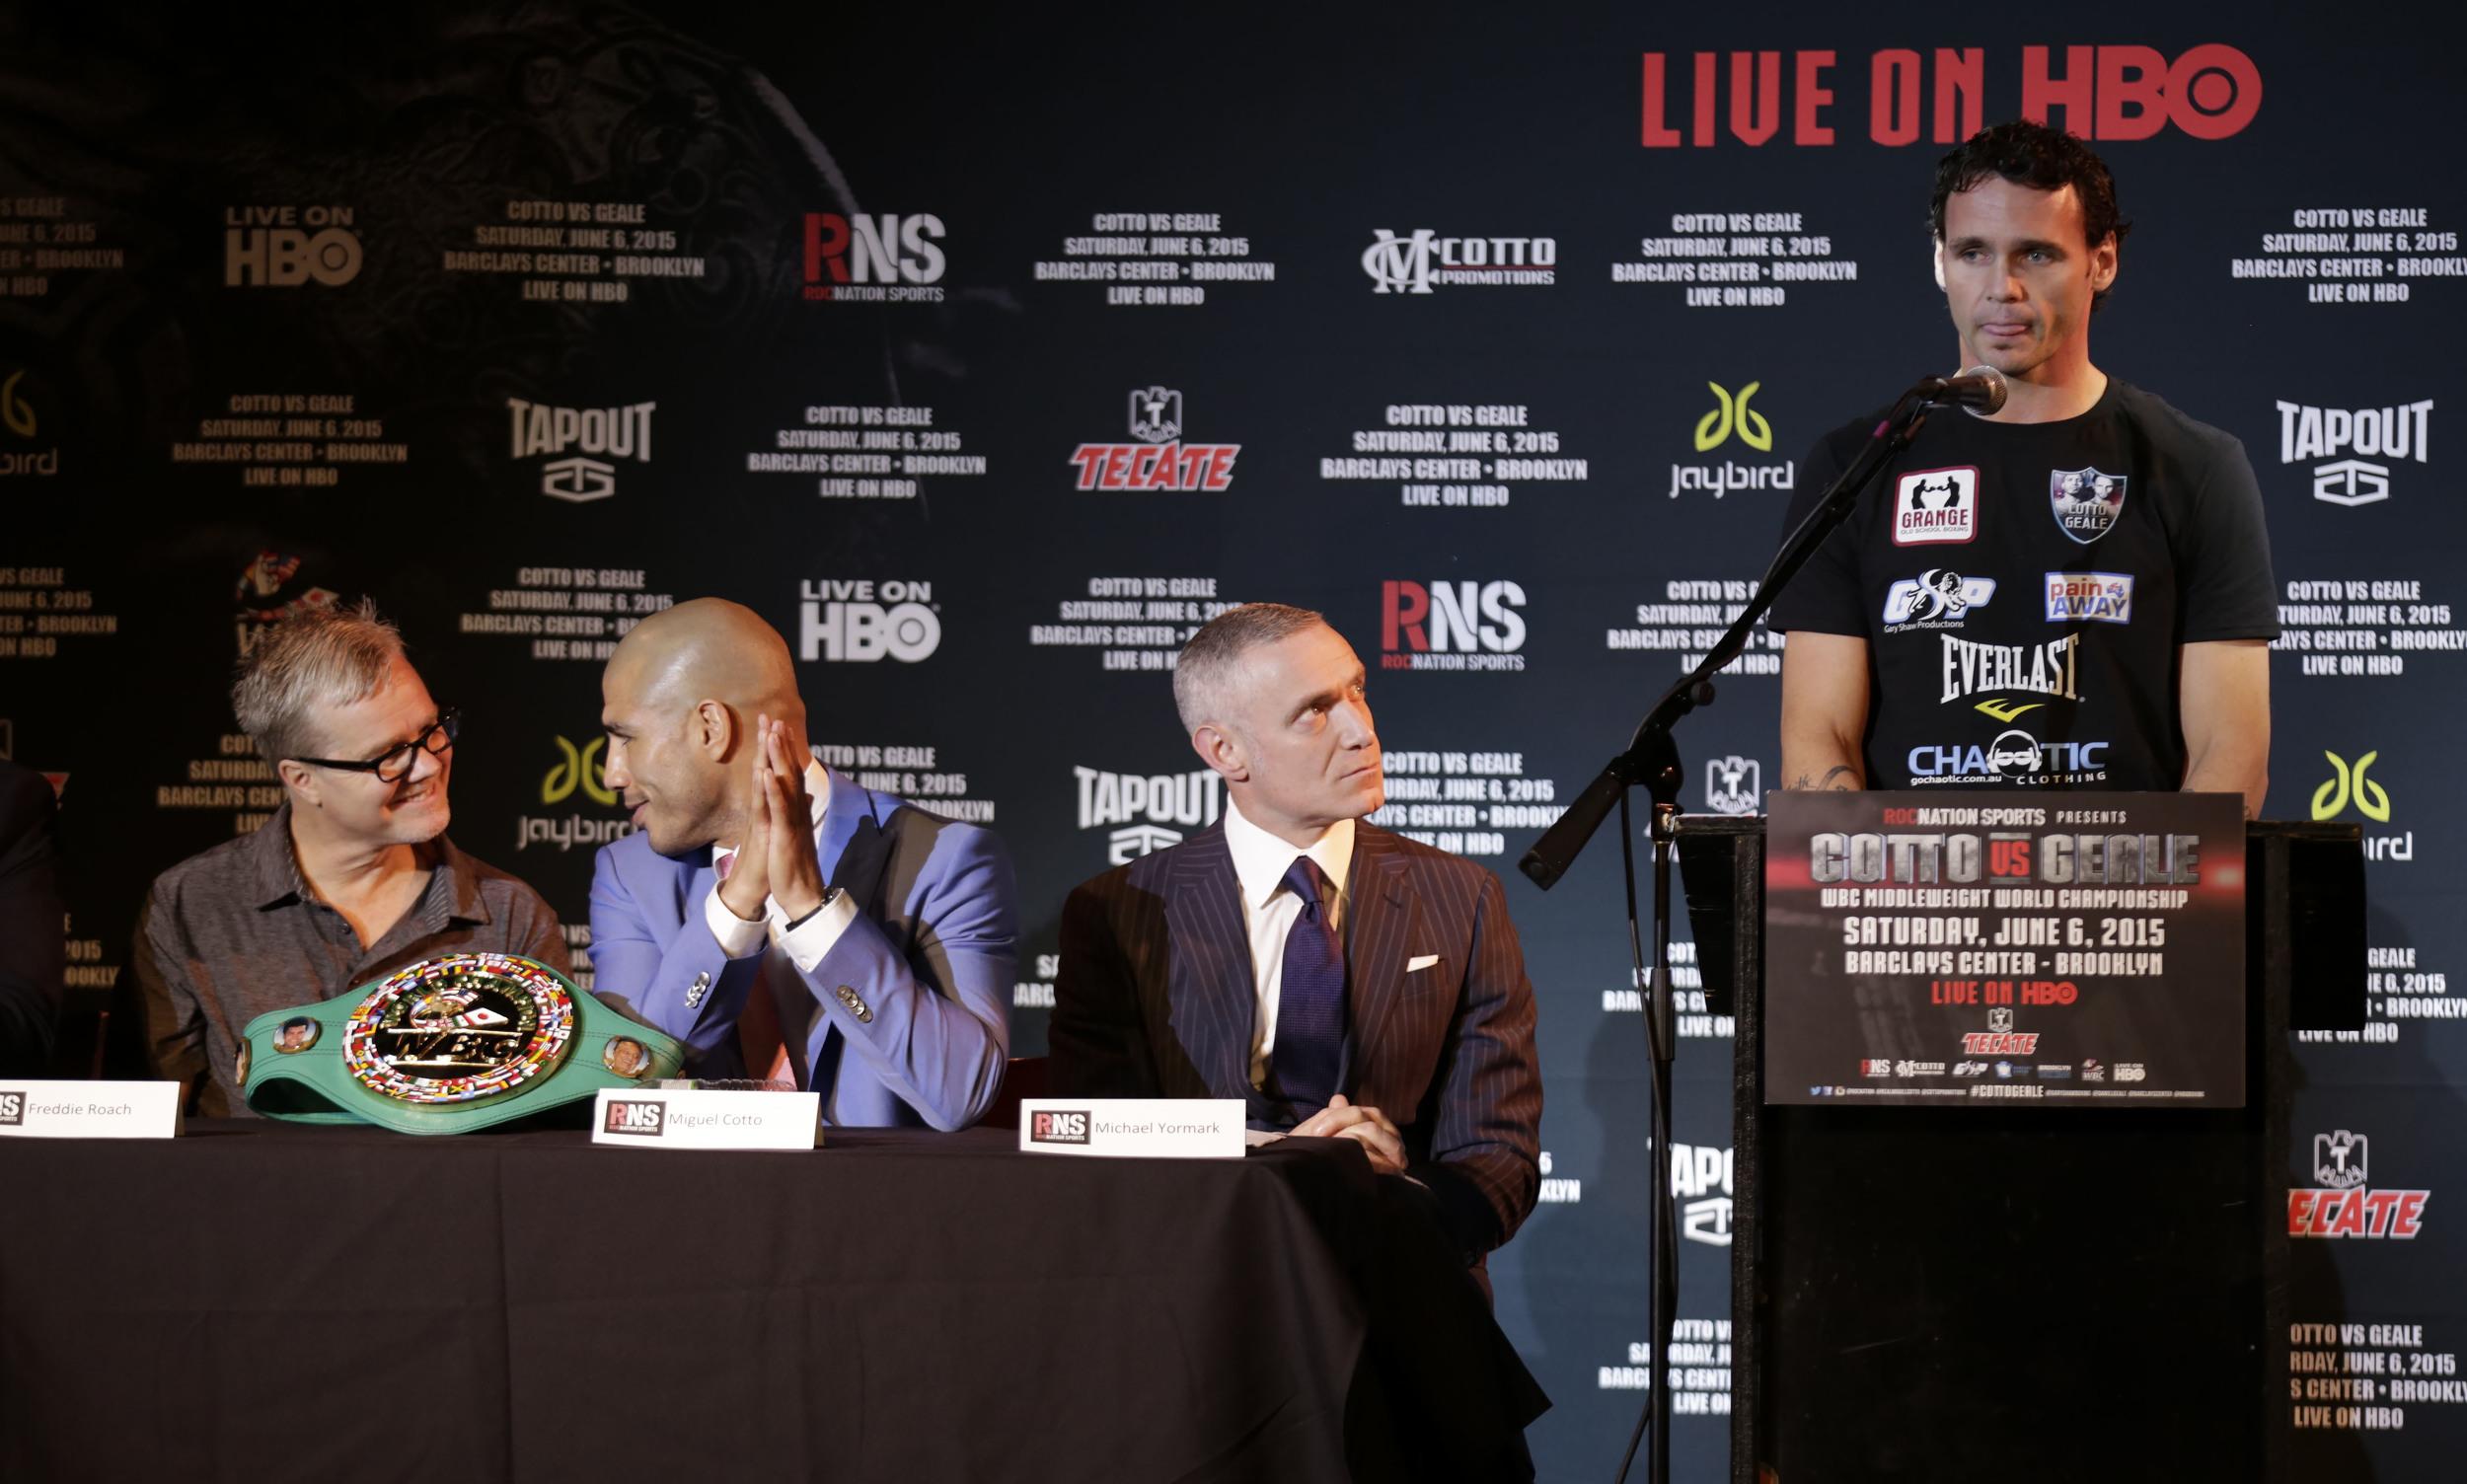 Press Conference Cotto vs Geale 13 (2).JPG